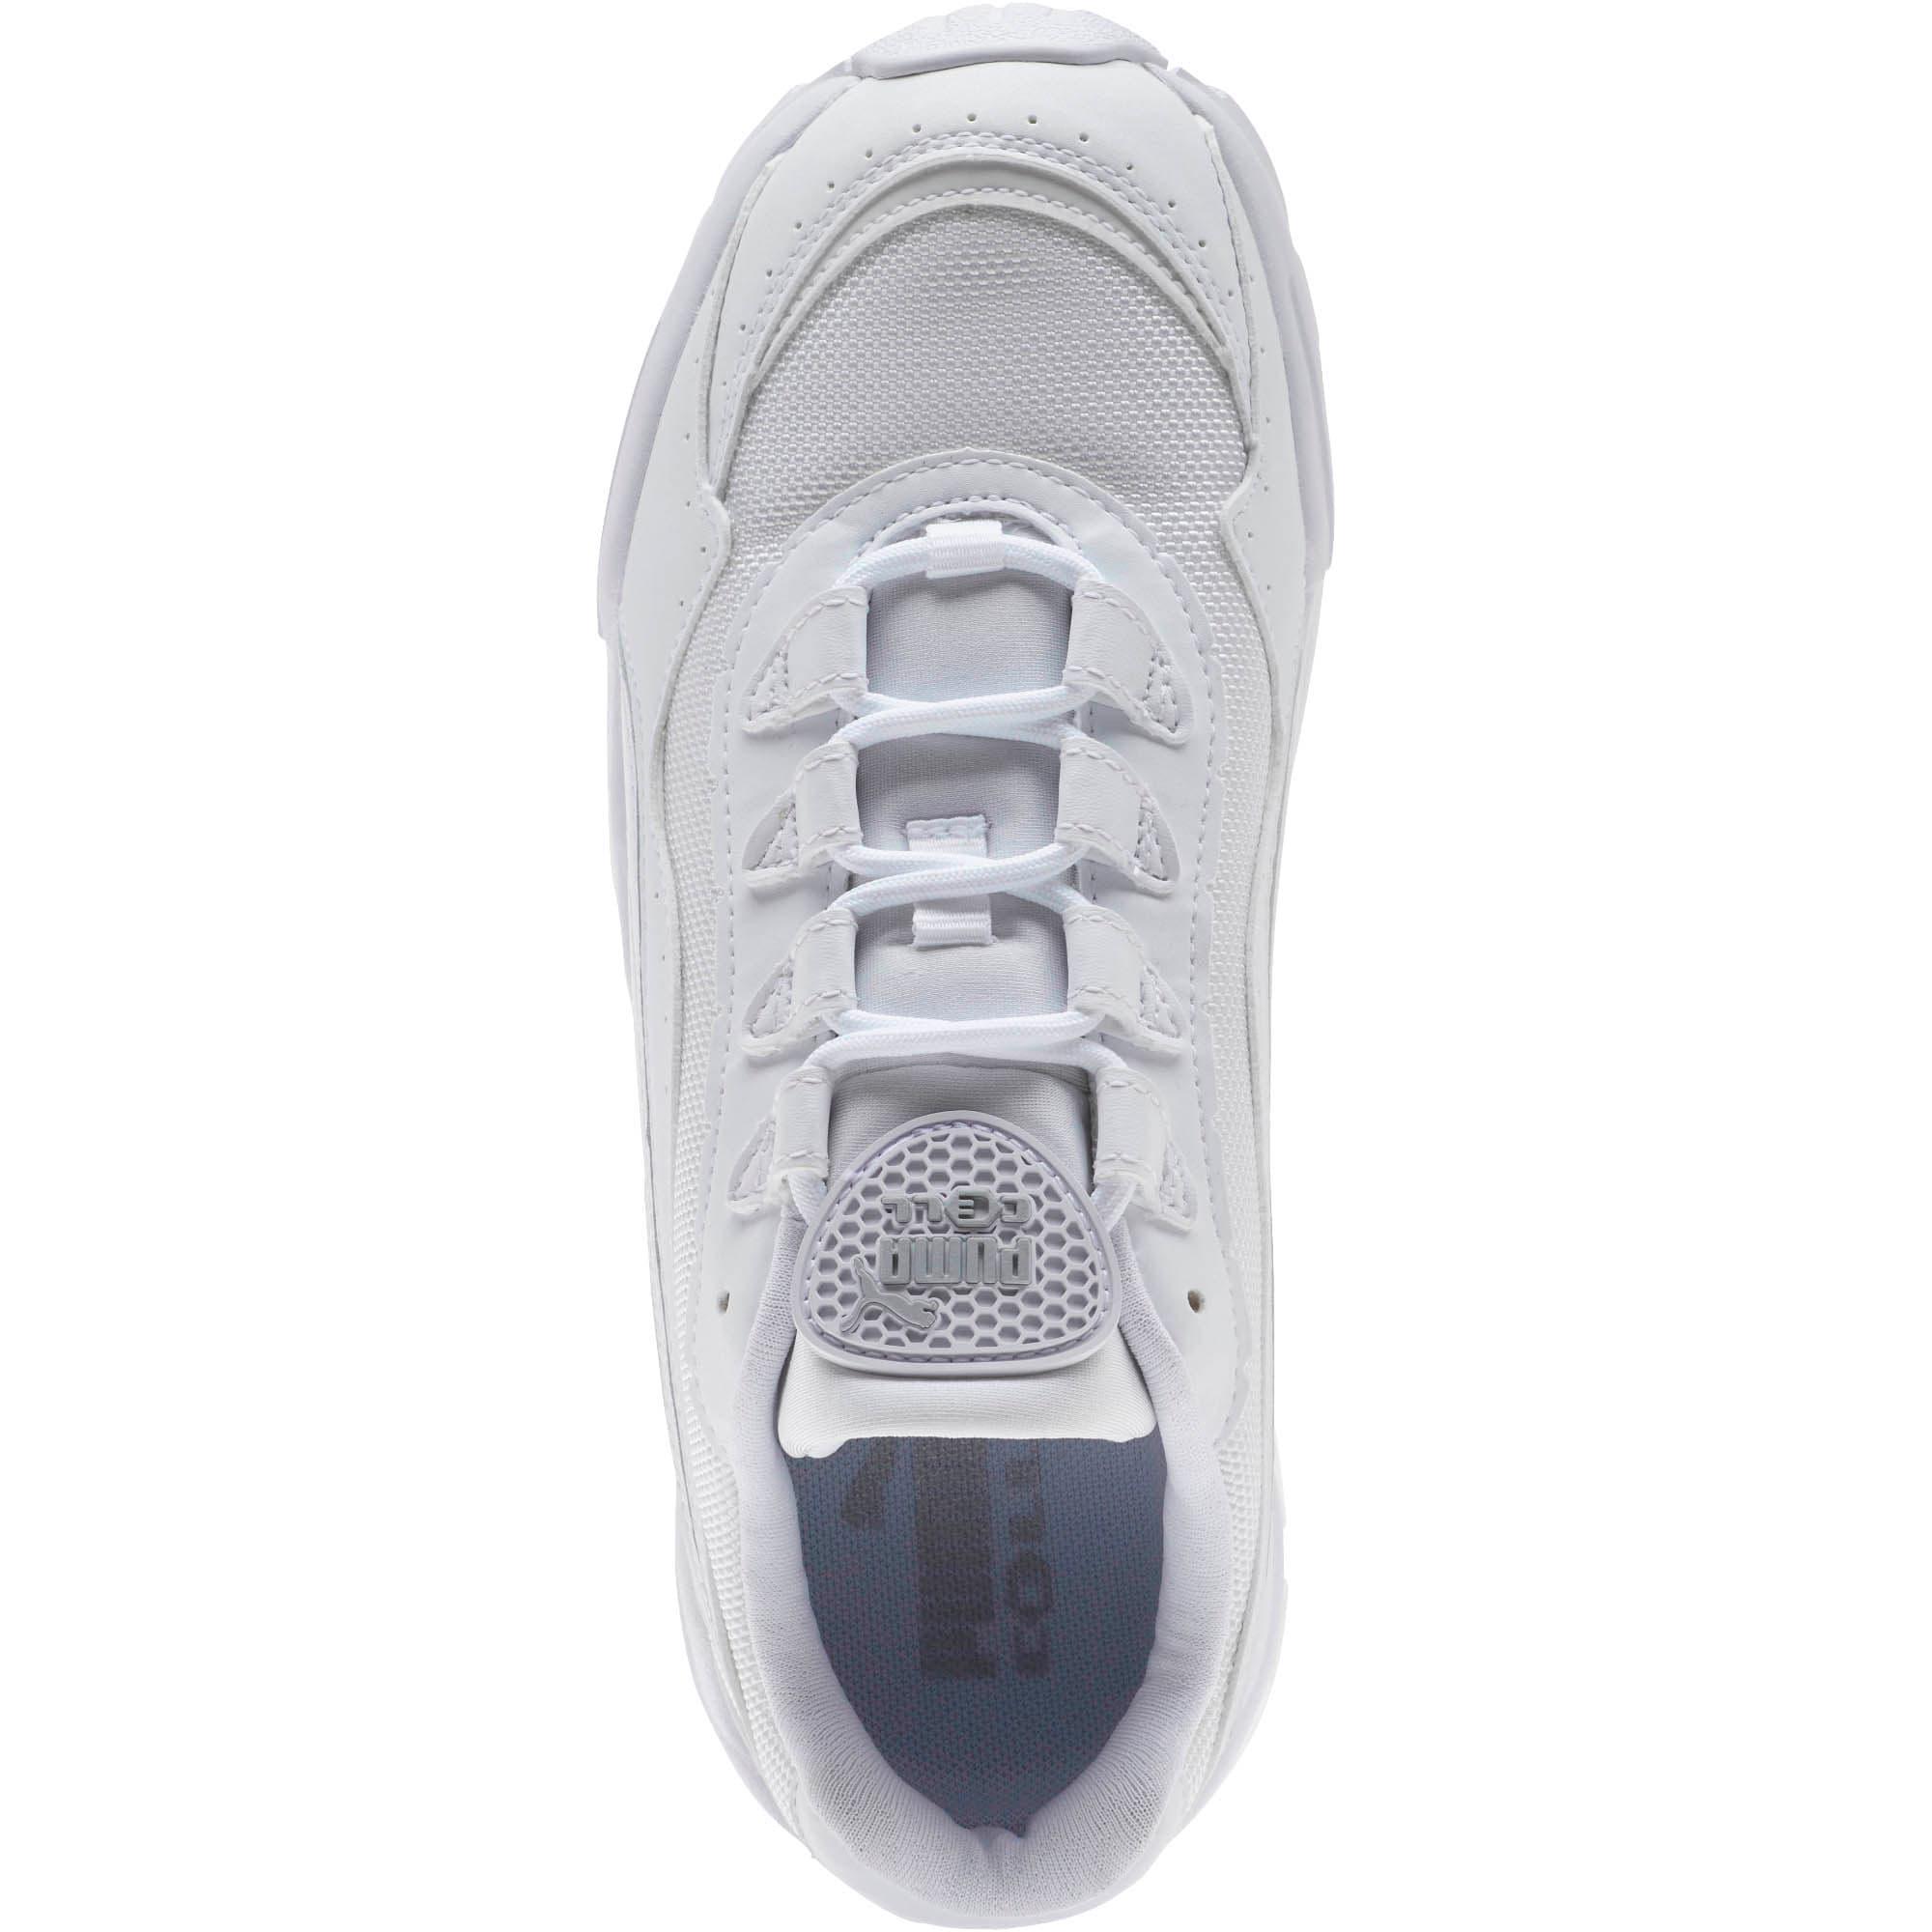 Thumbnail 5 of CELL Stellar Women's Sneakers, Puma White-Silver, medium